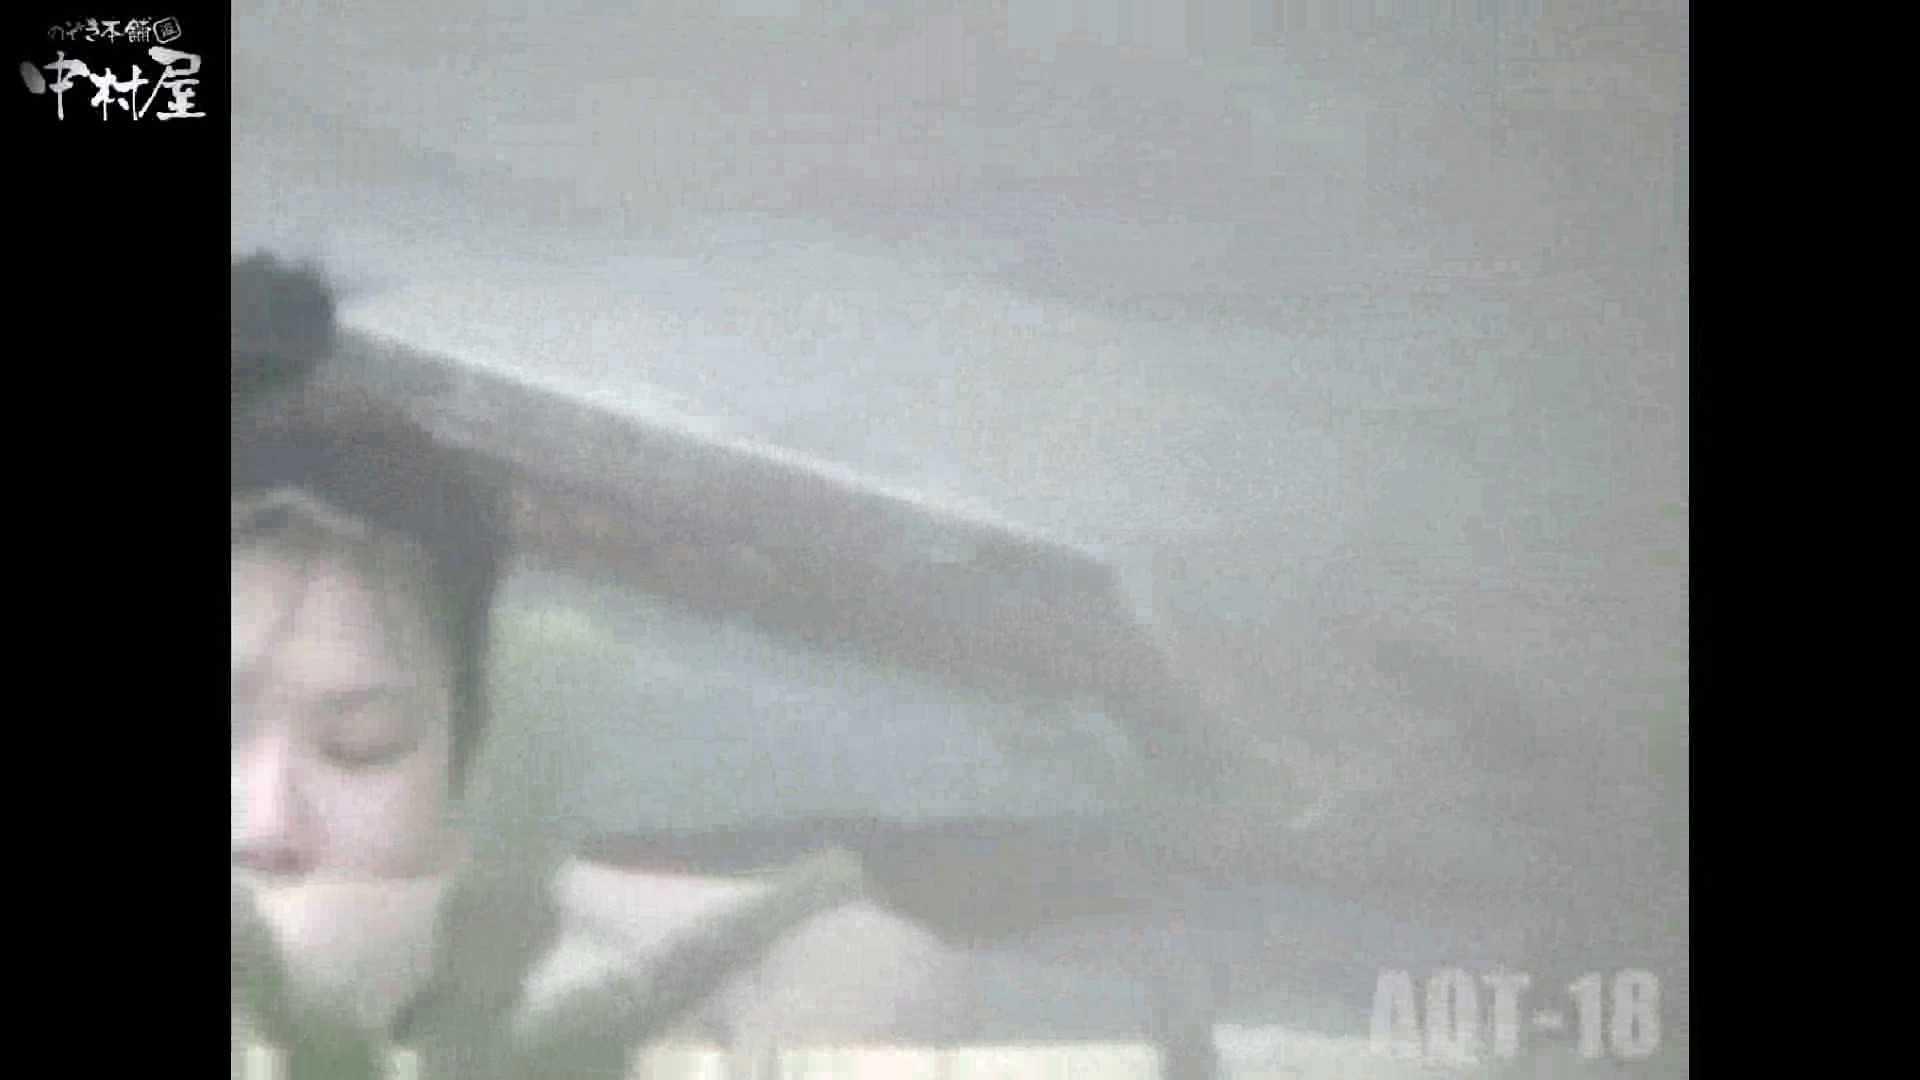 Aquaな露天風呂Vol.882潜入盗撮露天風呂十八判湯 其の二 OLセックス  90画像 16